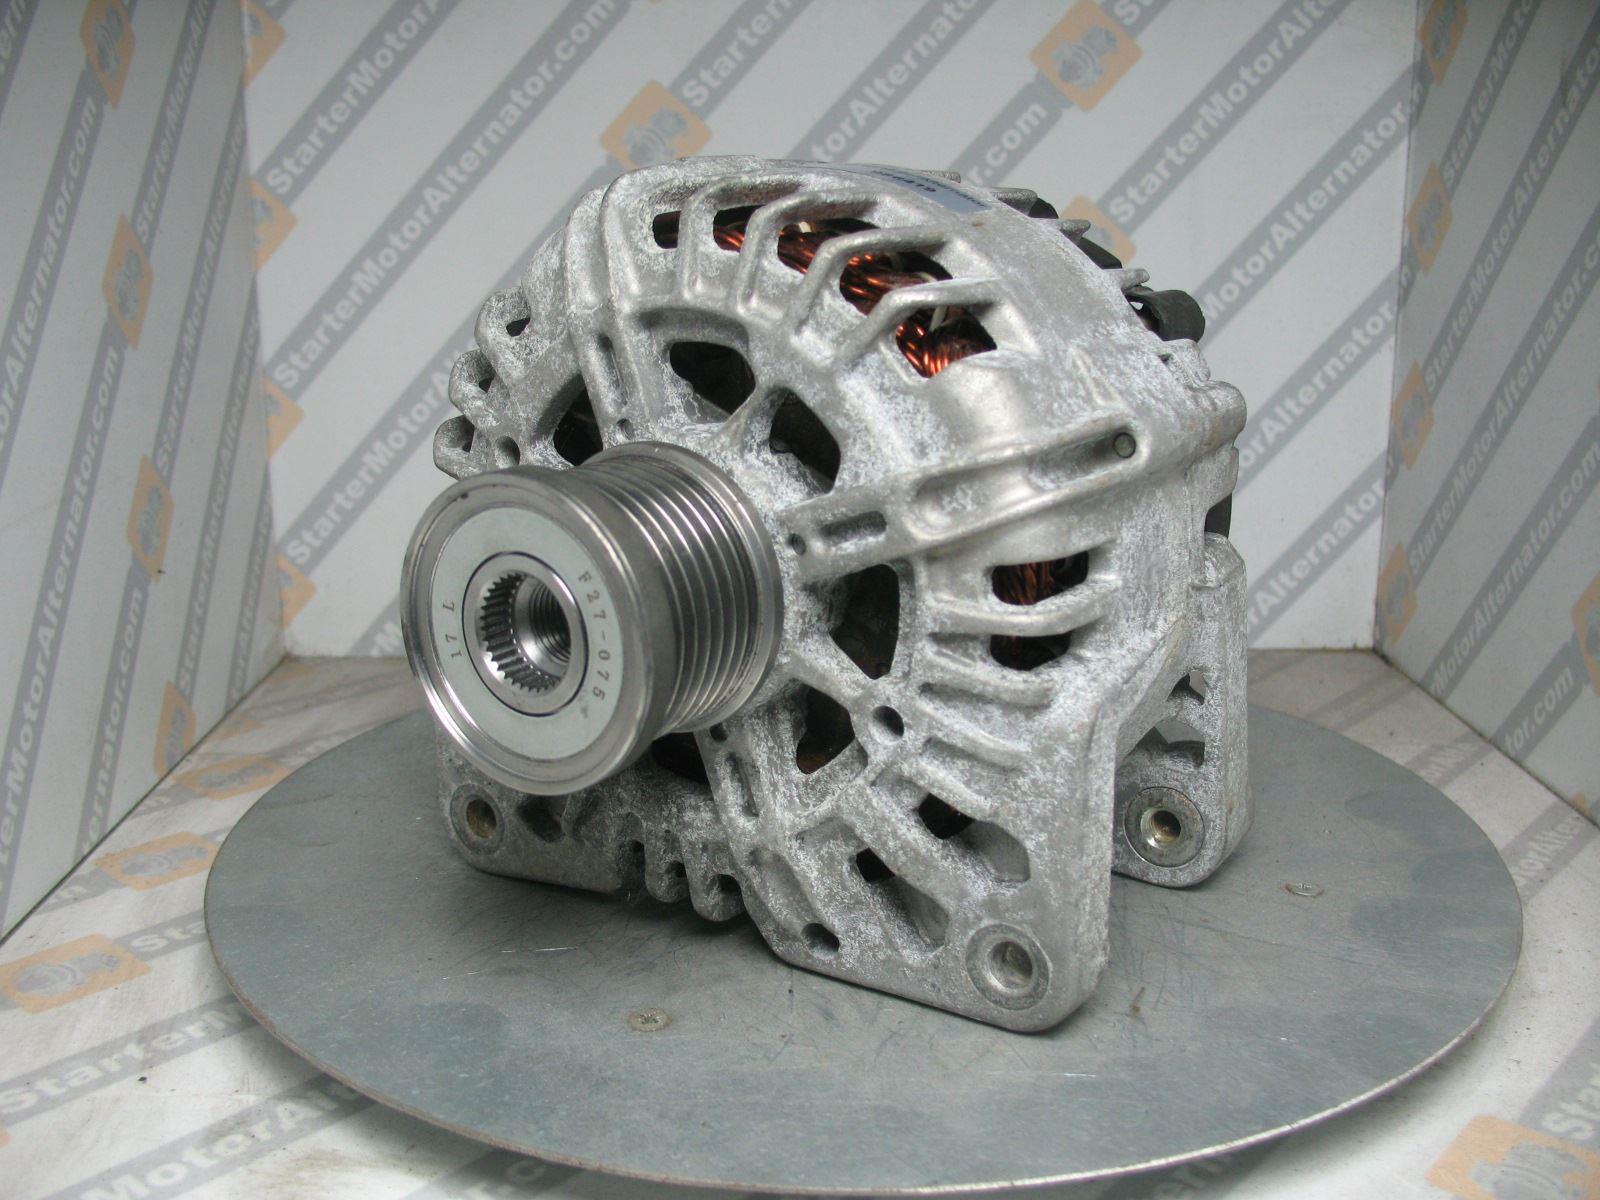 XIK3036 Alternator For Nissan / Opel / Renault / Vauxhall